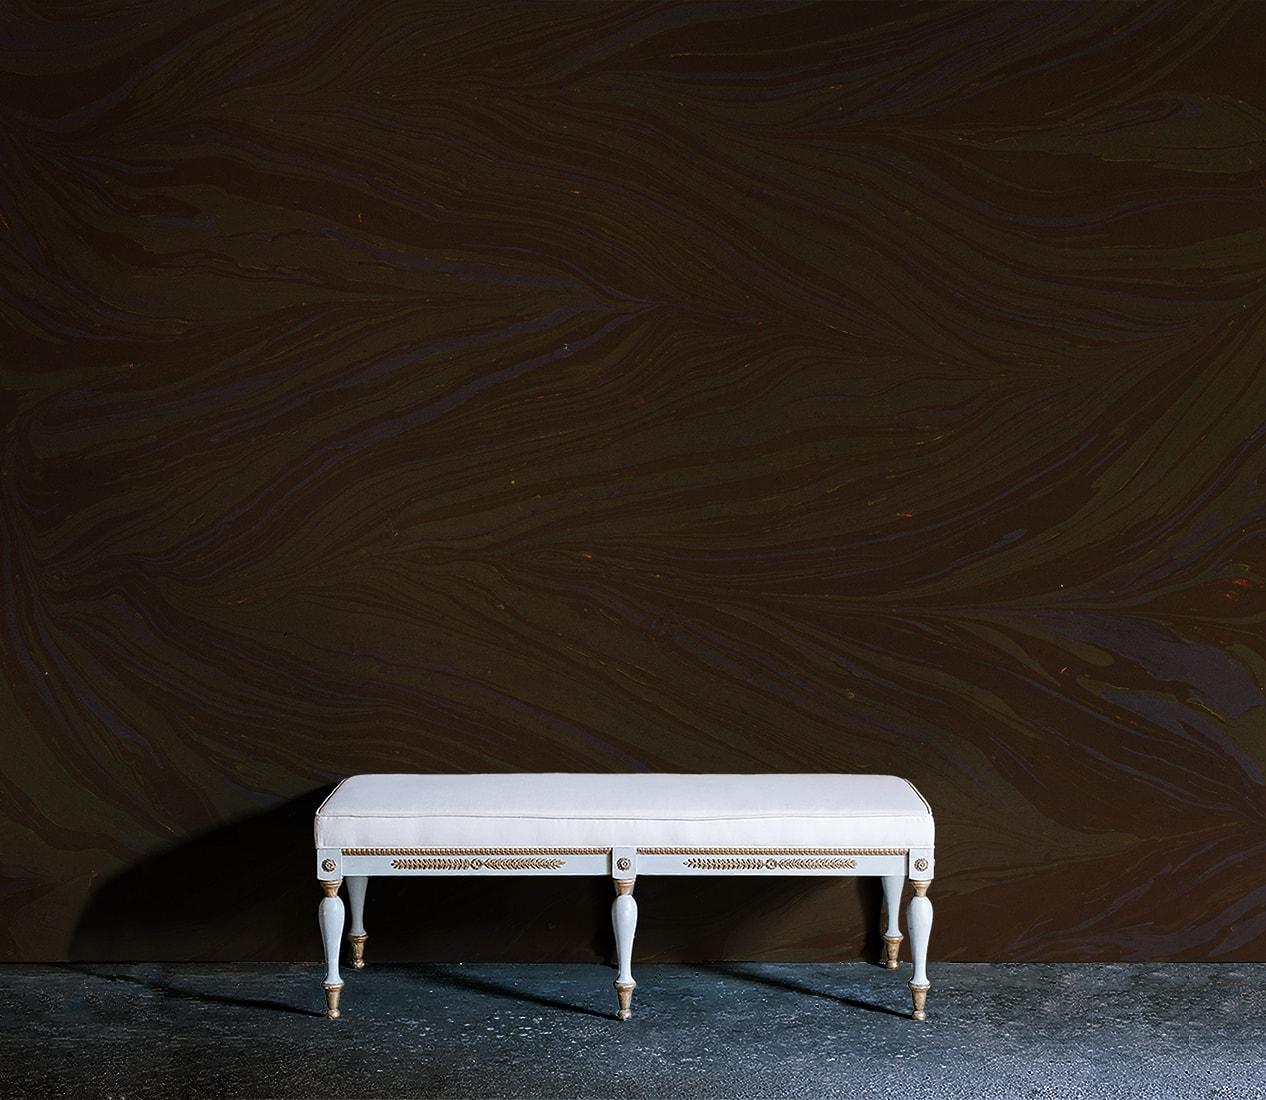 MARBLE-04-Panoramic-views-Elusio-Antique-Design-product-min.jpg